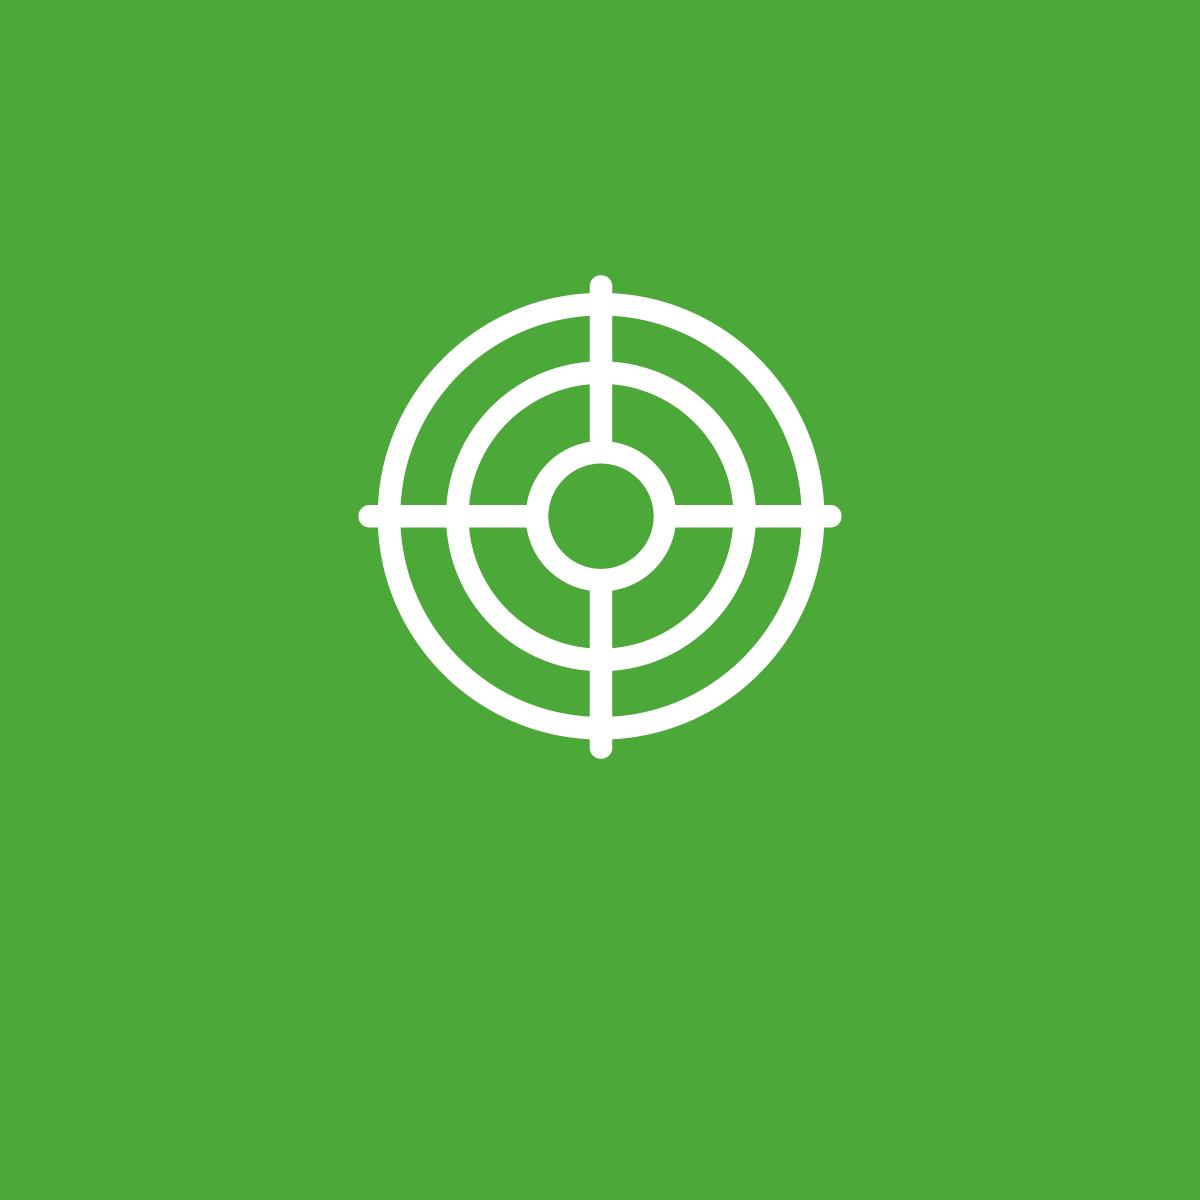 36pt - Mapa de propósito